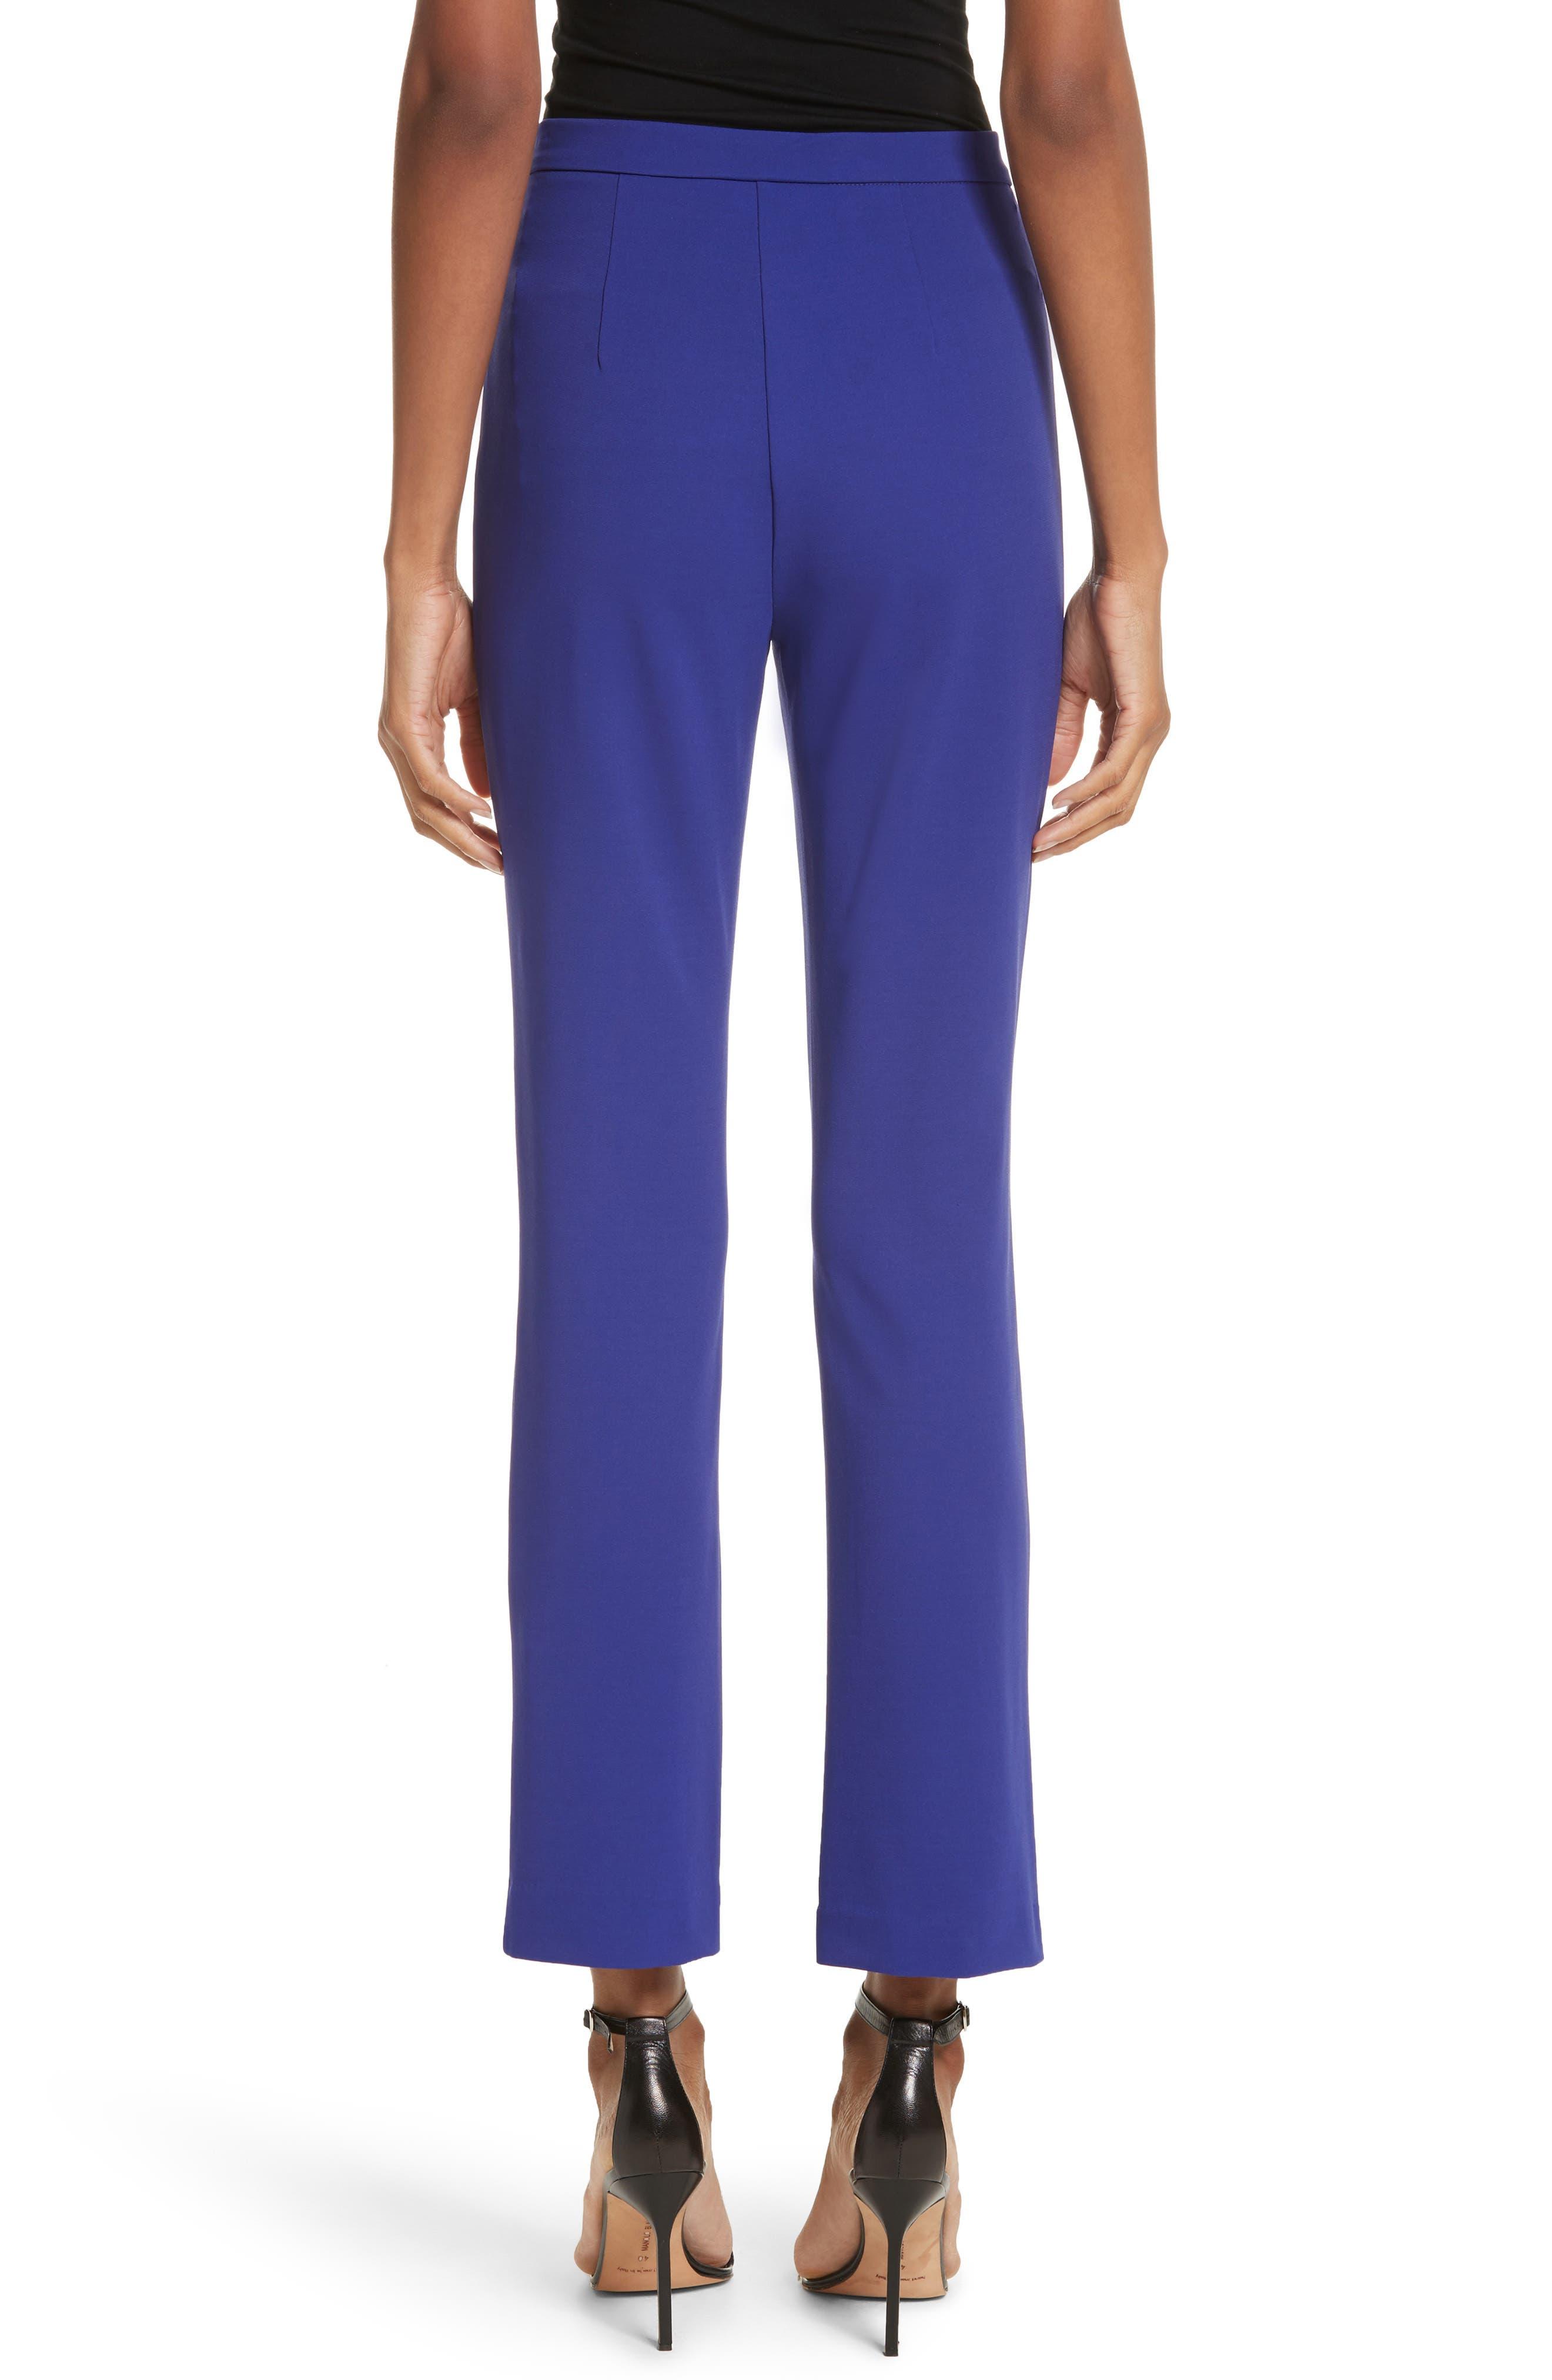 Calerno Crepe Crop Trousers,                             Alternate thumbnail 2, color,                             Violet